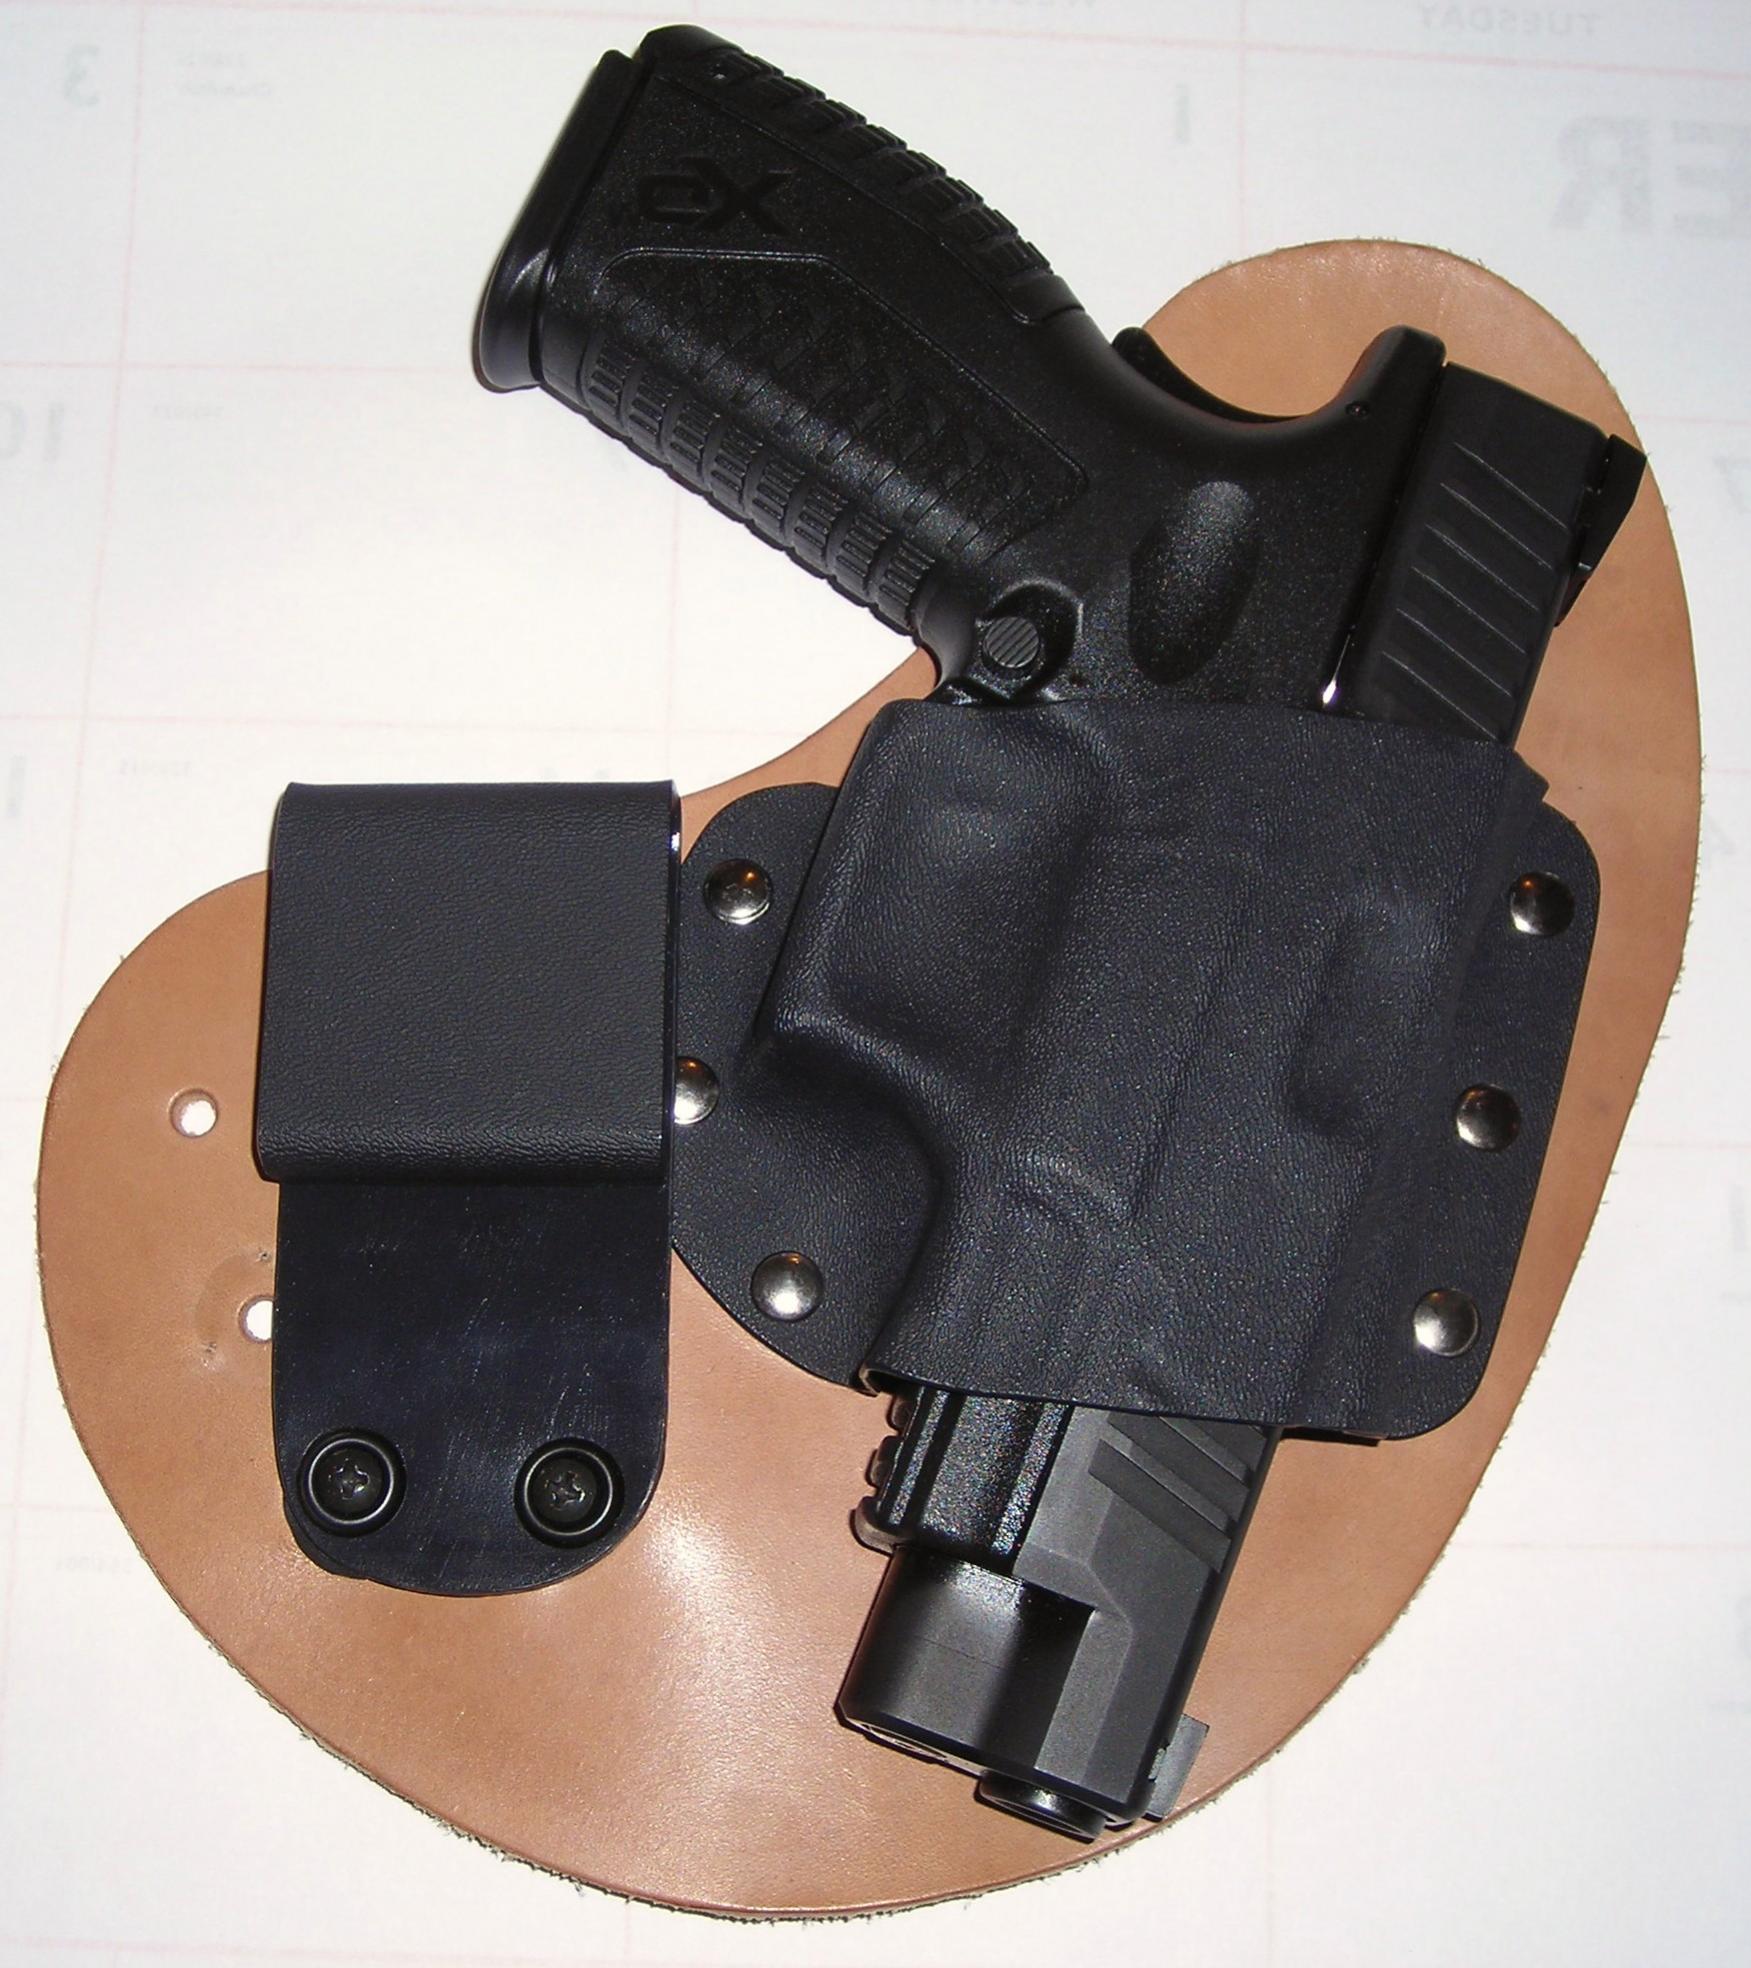 Crossbreed qwikclip-quikclip-gun.jpg